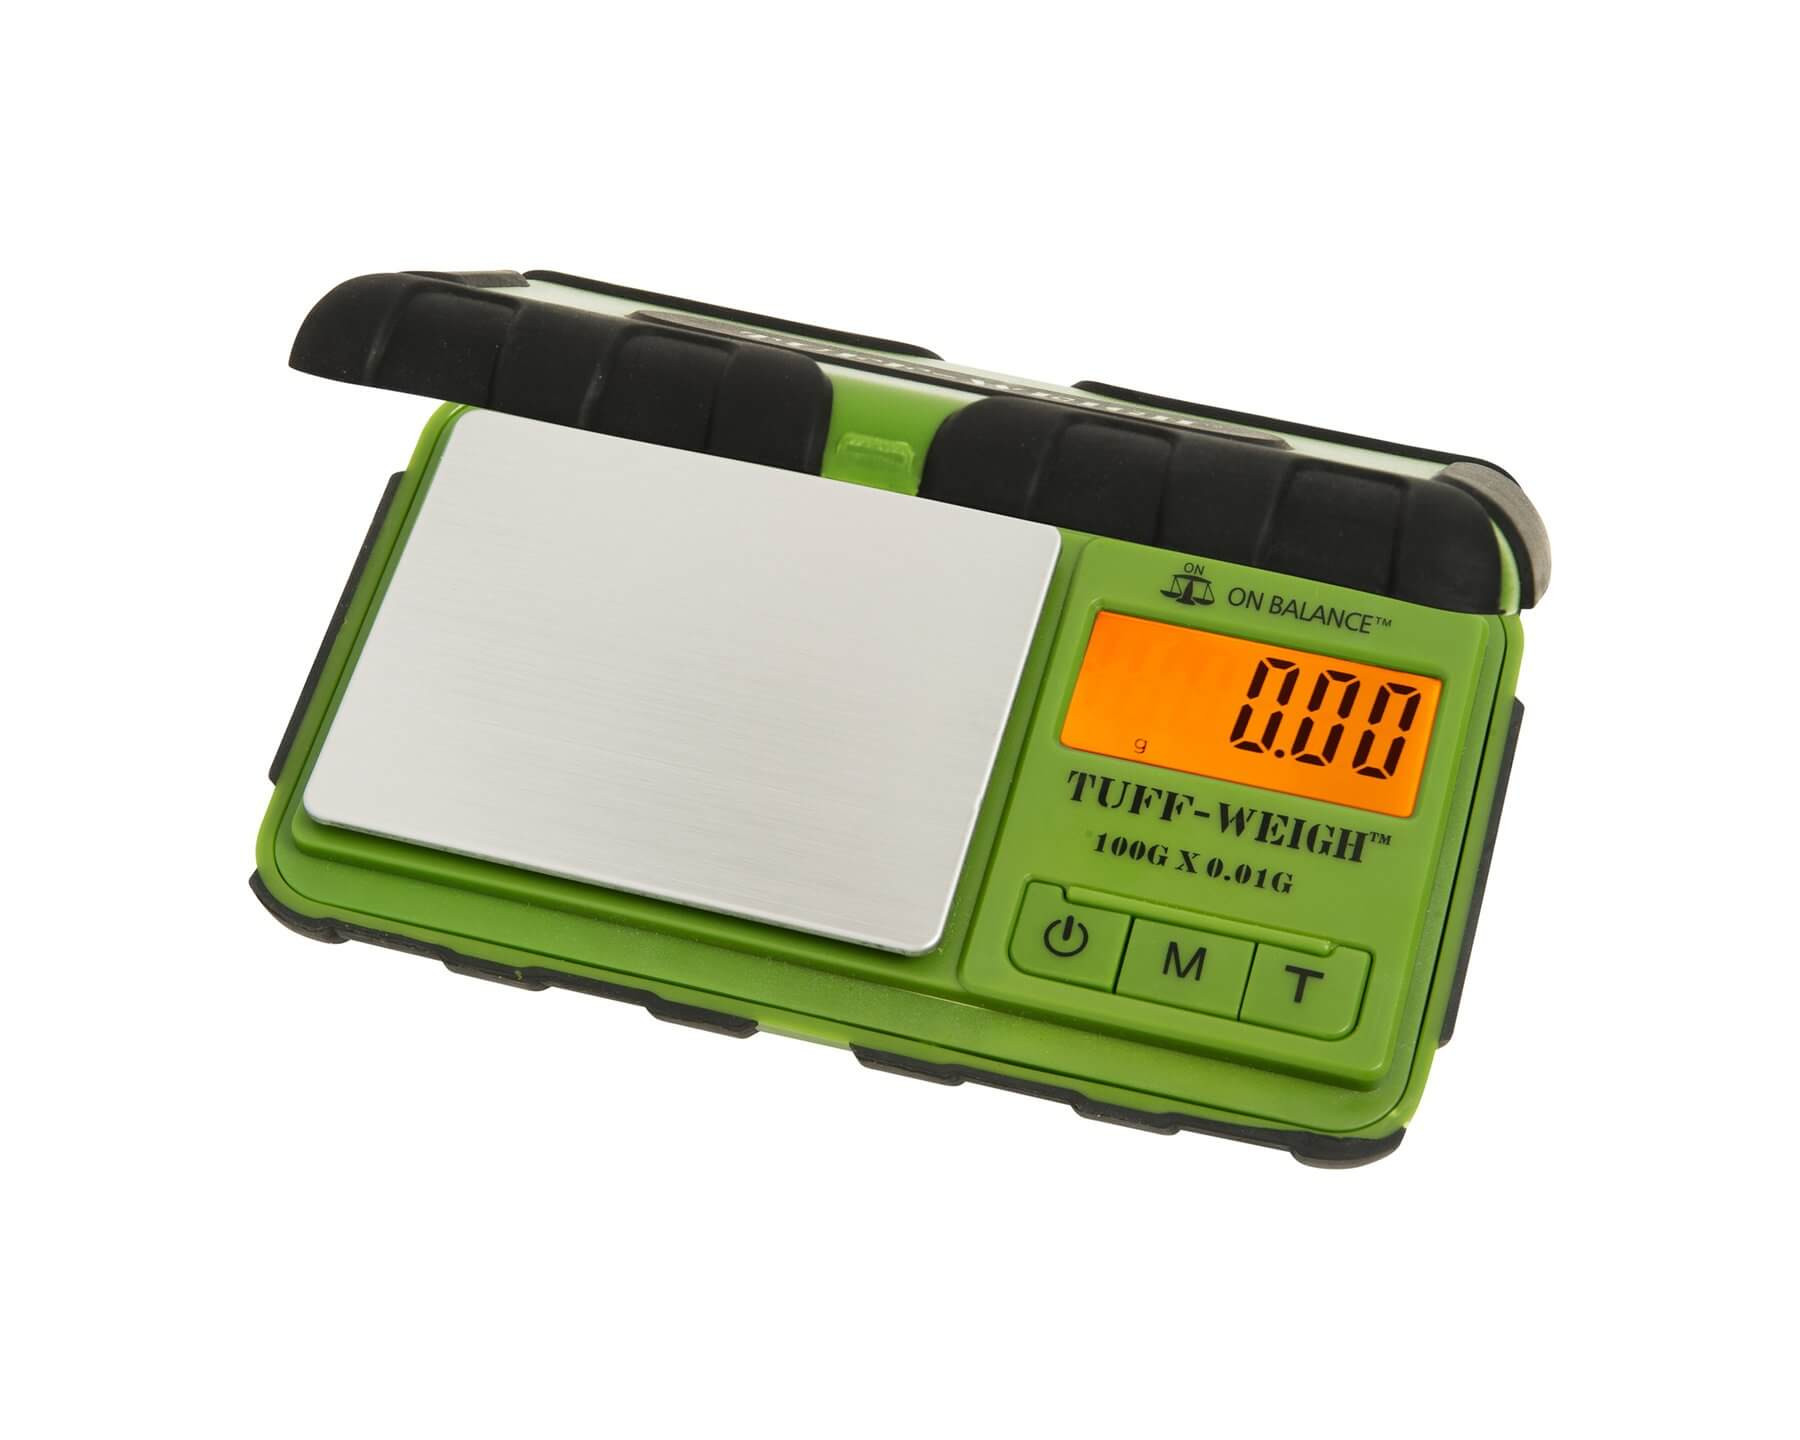 On Balance TUF-100 Tuff Weigh Pocket Scale (100g x 0.01g) - Green